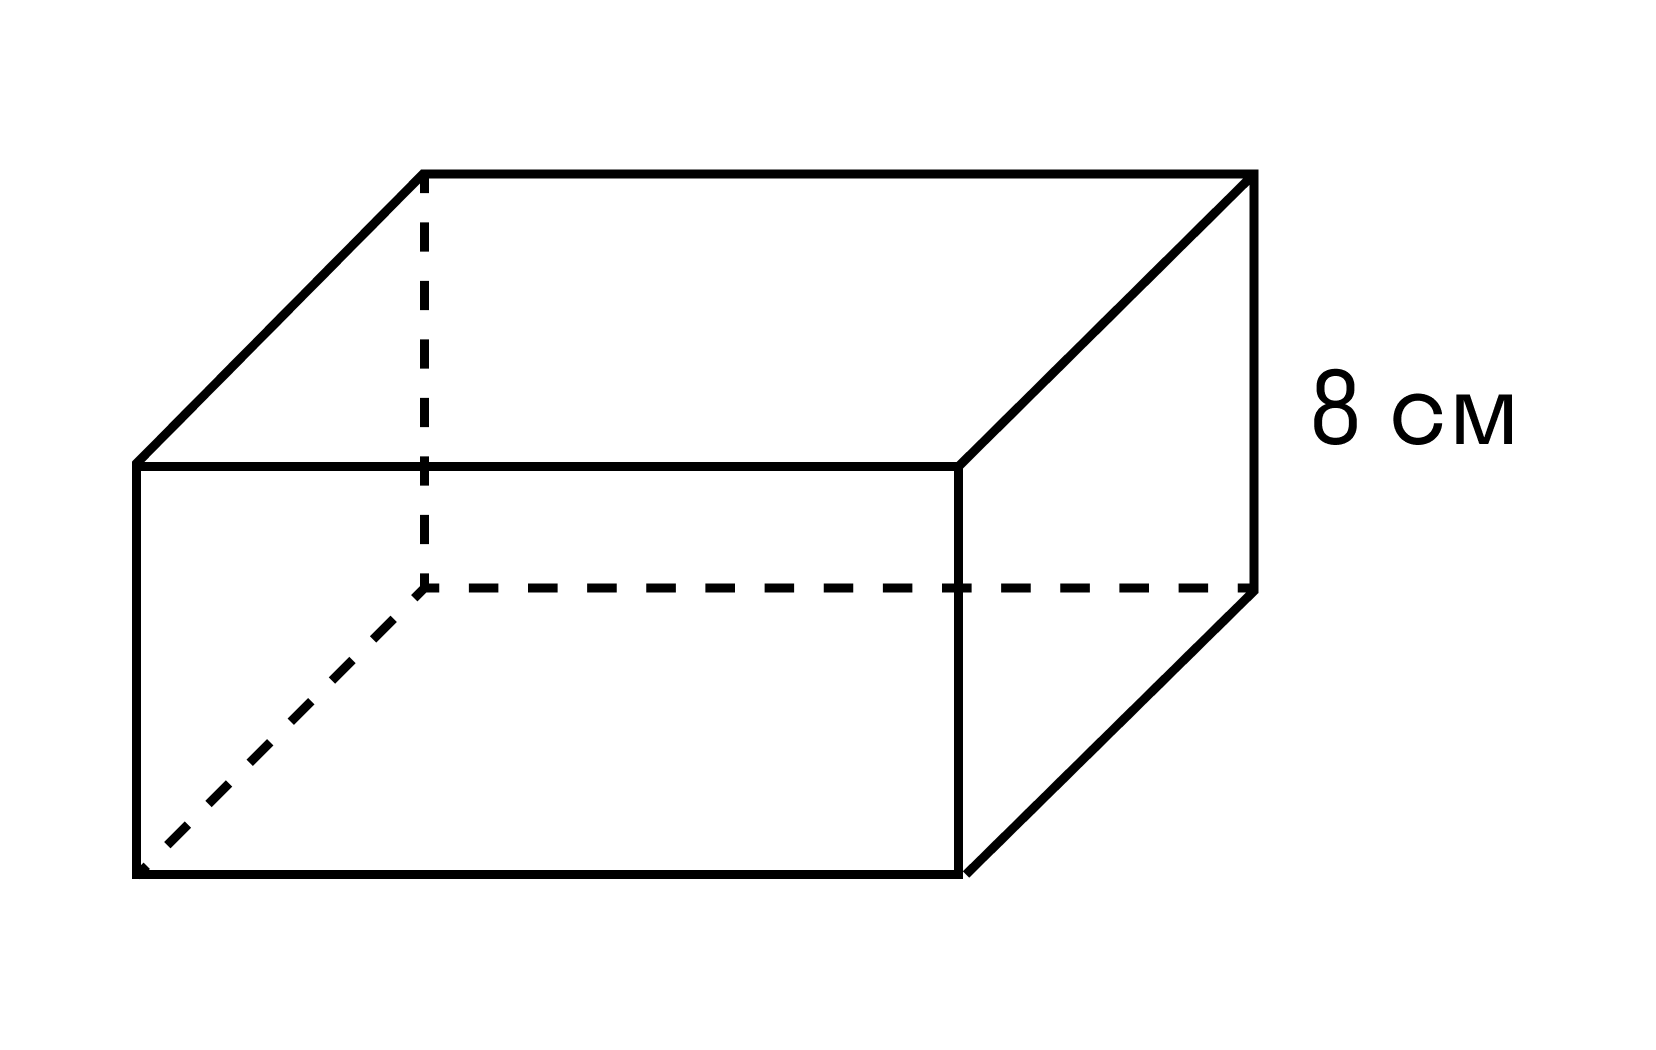 Чему равен объем параллелепипеда рис2